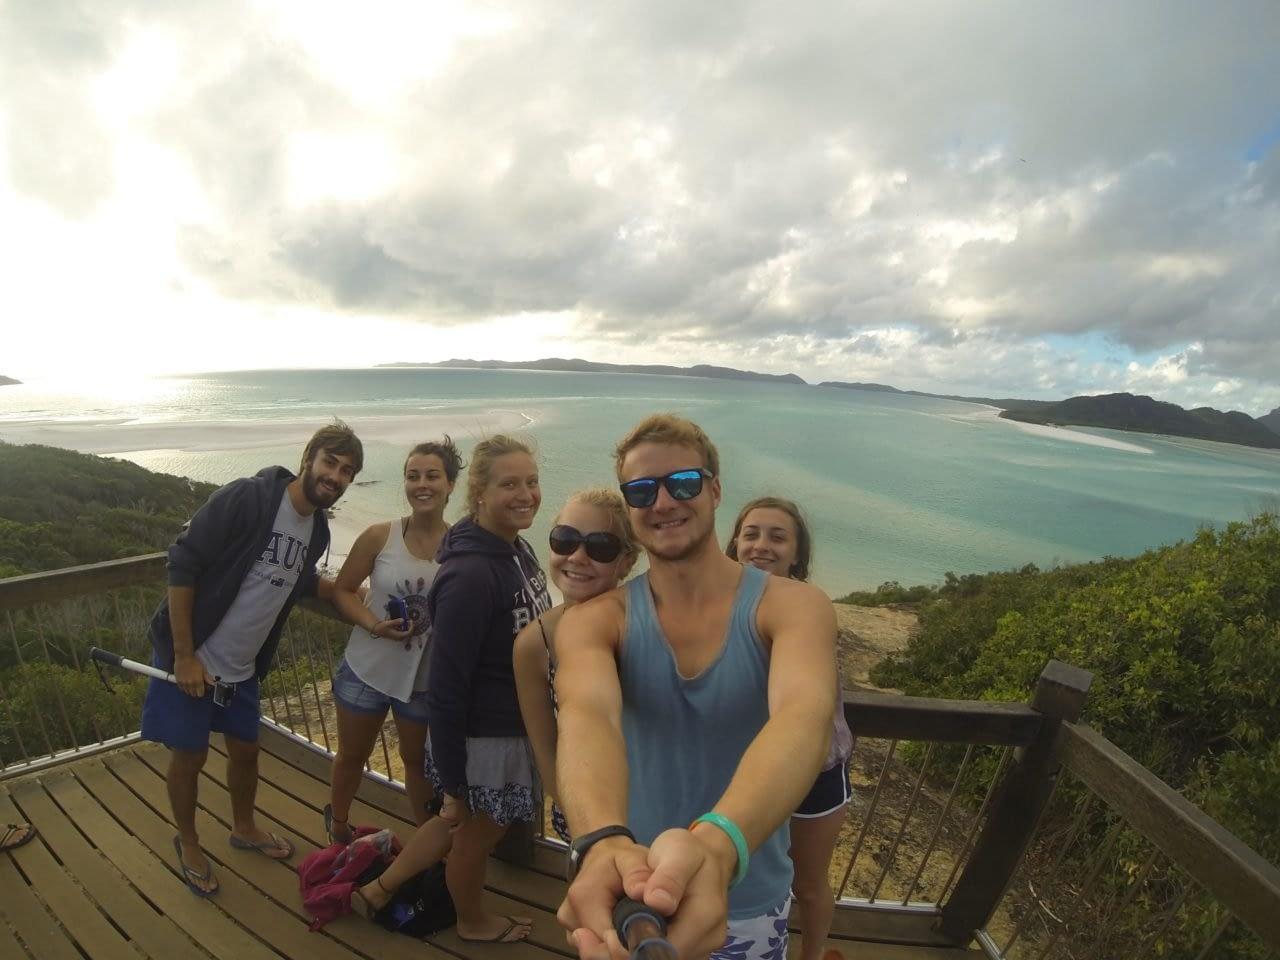 Highlands2Hammocks selfie overlooking a lake